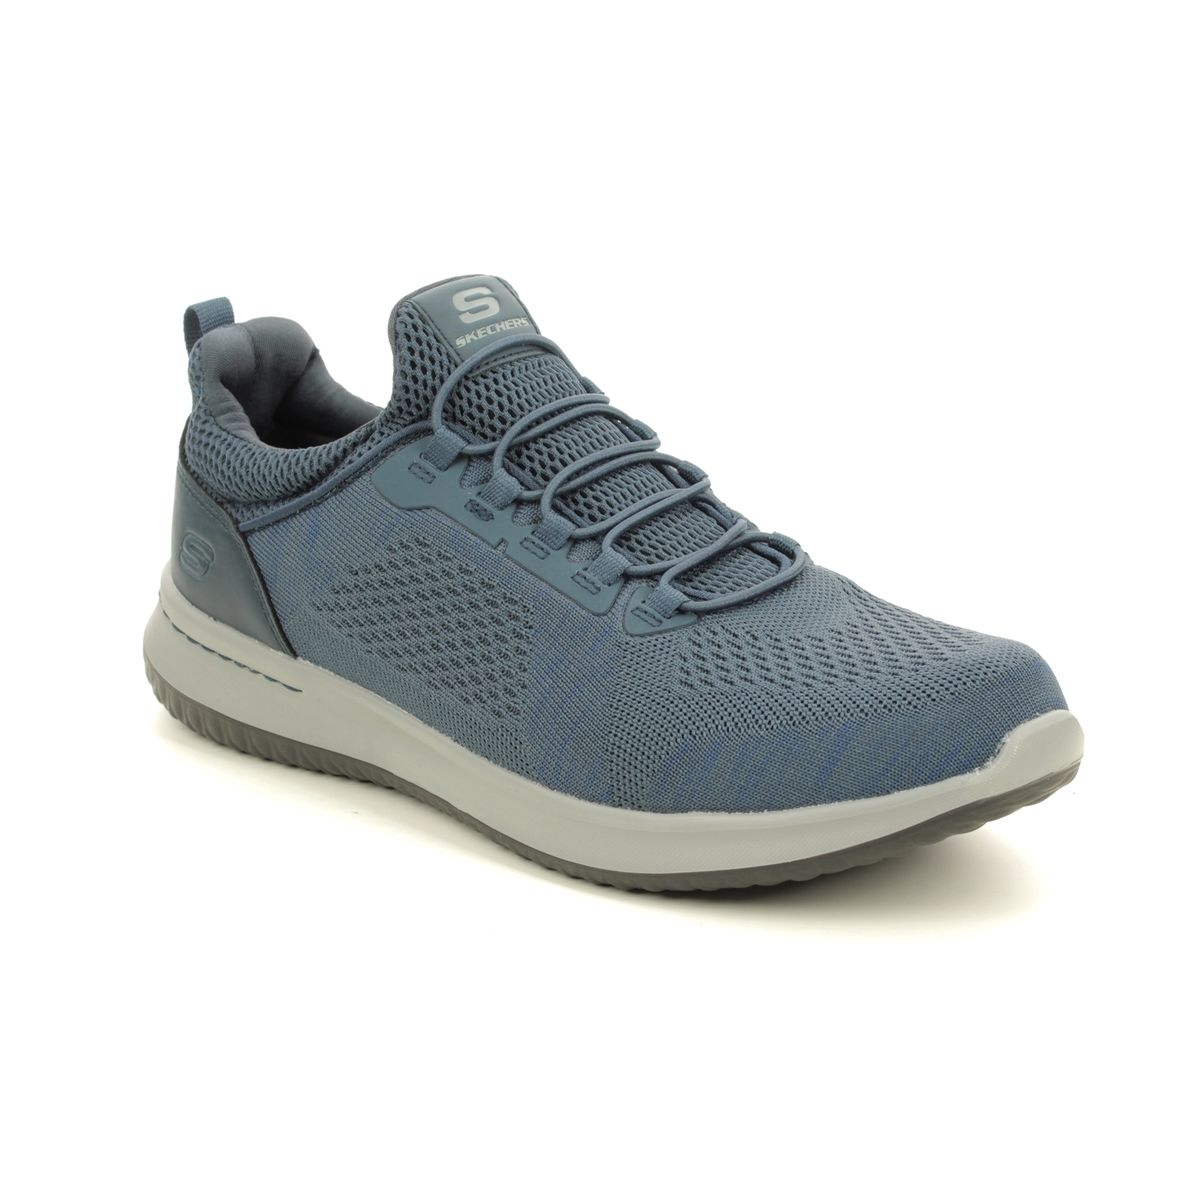 Skechers Delson Brewton 65509 BLU Blue